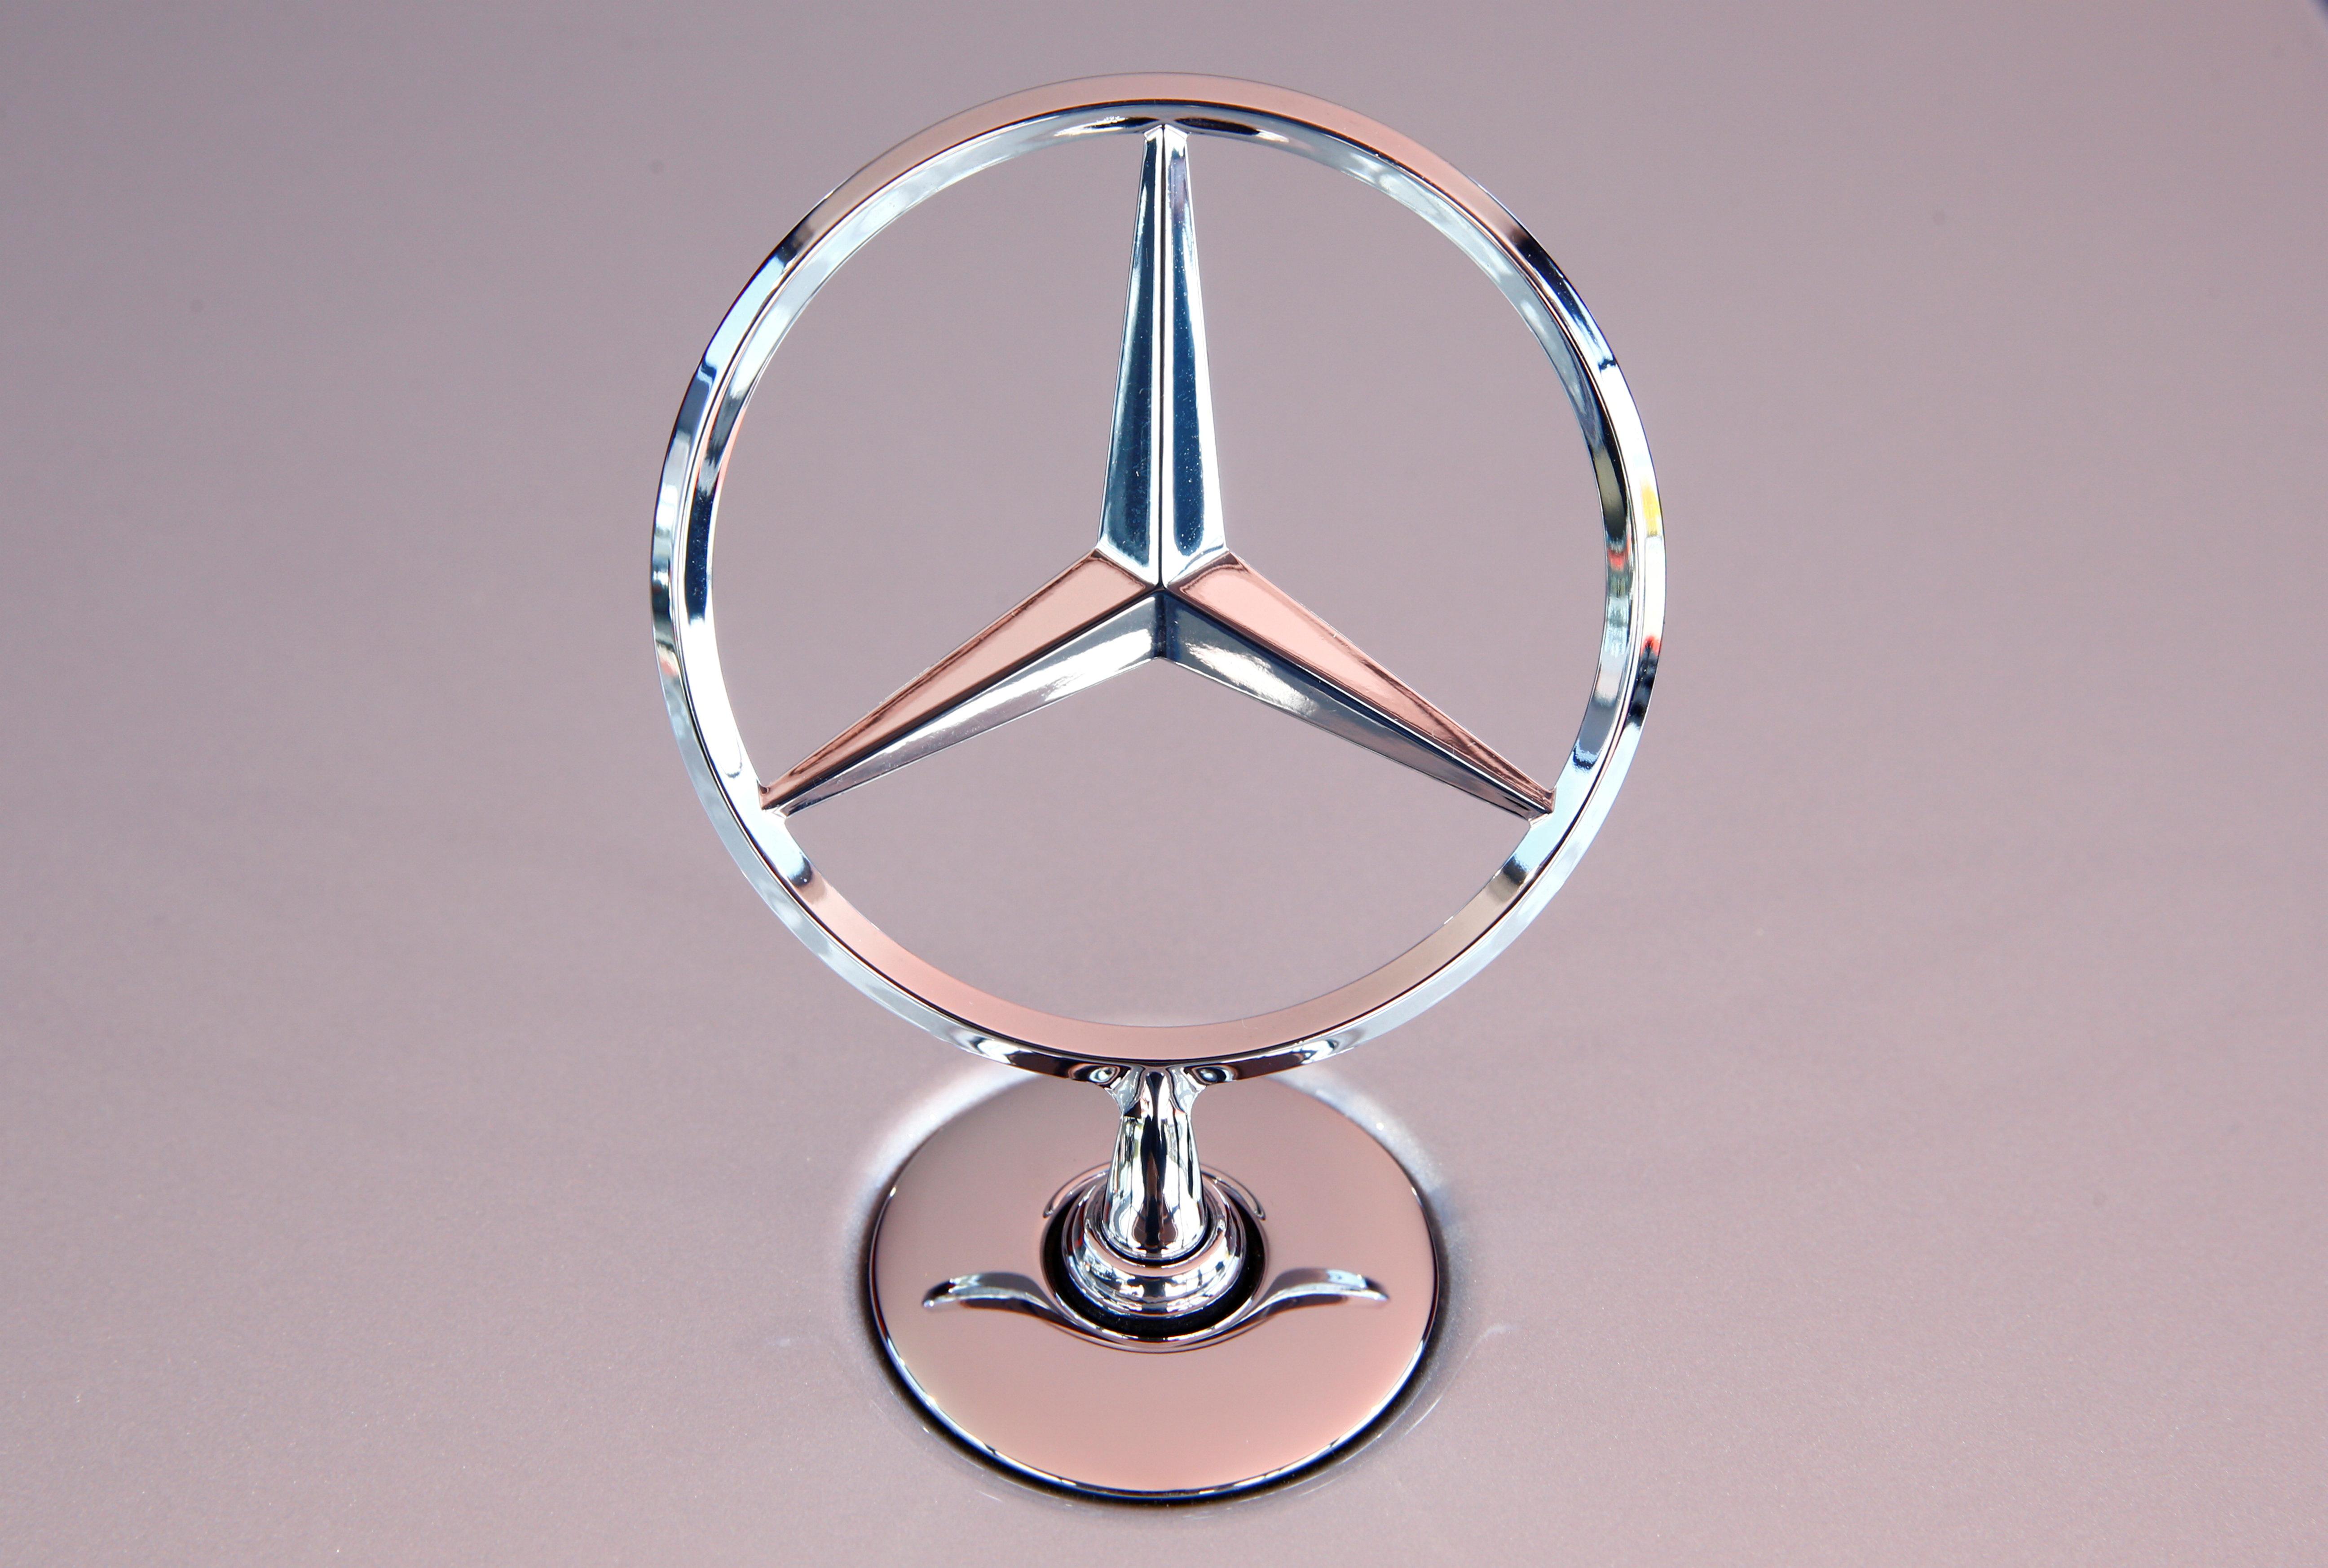 The Mercedes Benz star is seen on the bonnet of a new Mercedes-Benz S-Class limousine at the company's test center, near Immendingen, Germany October 14, 2020.   REUTERS/Arnd Wiegmann